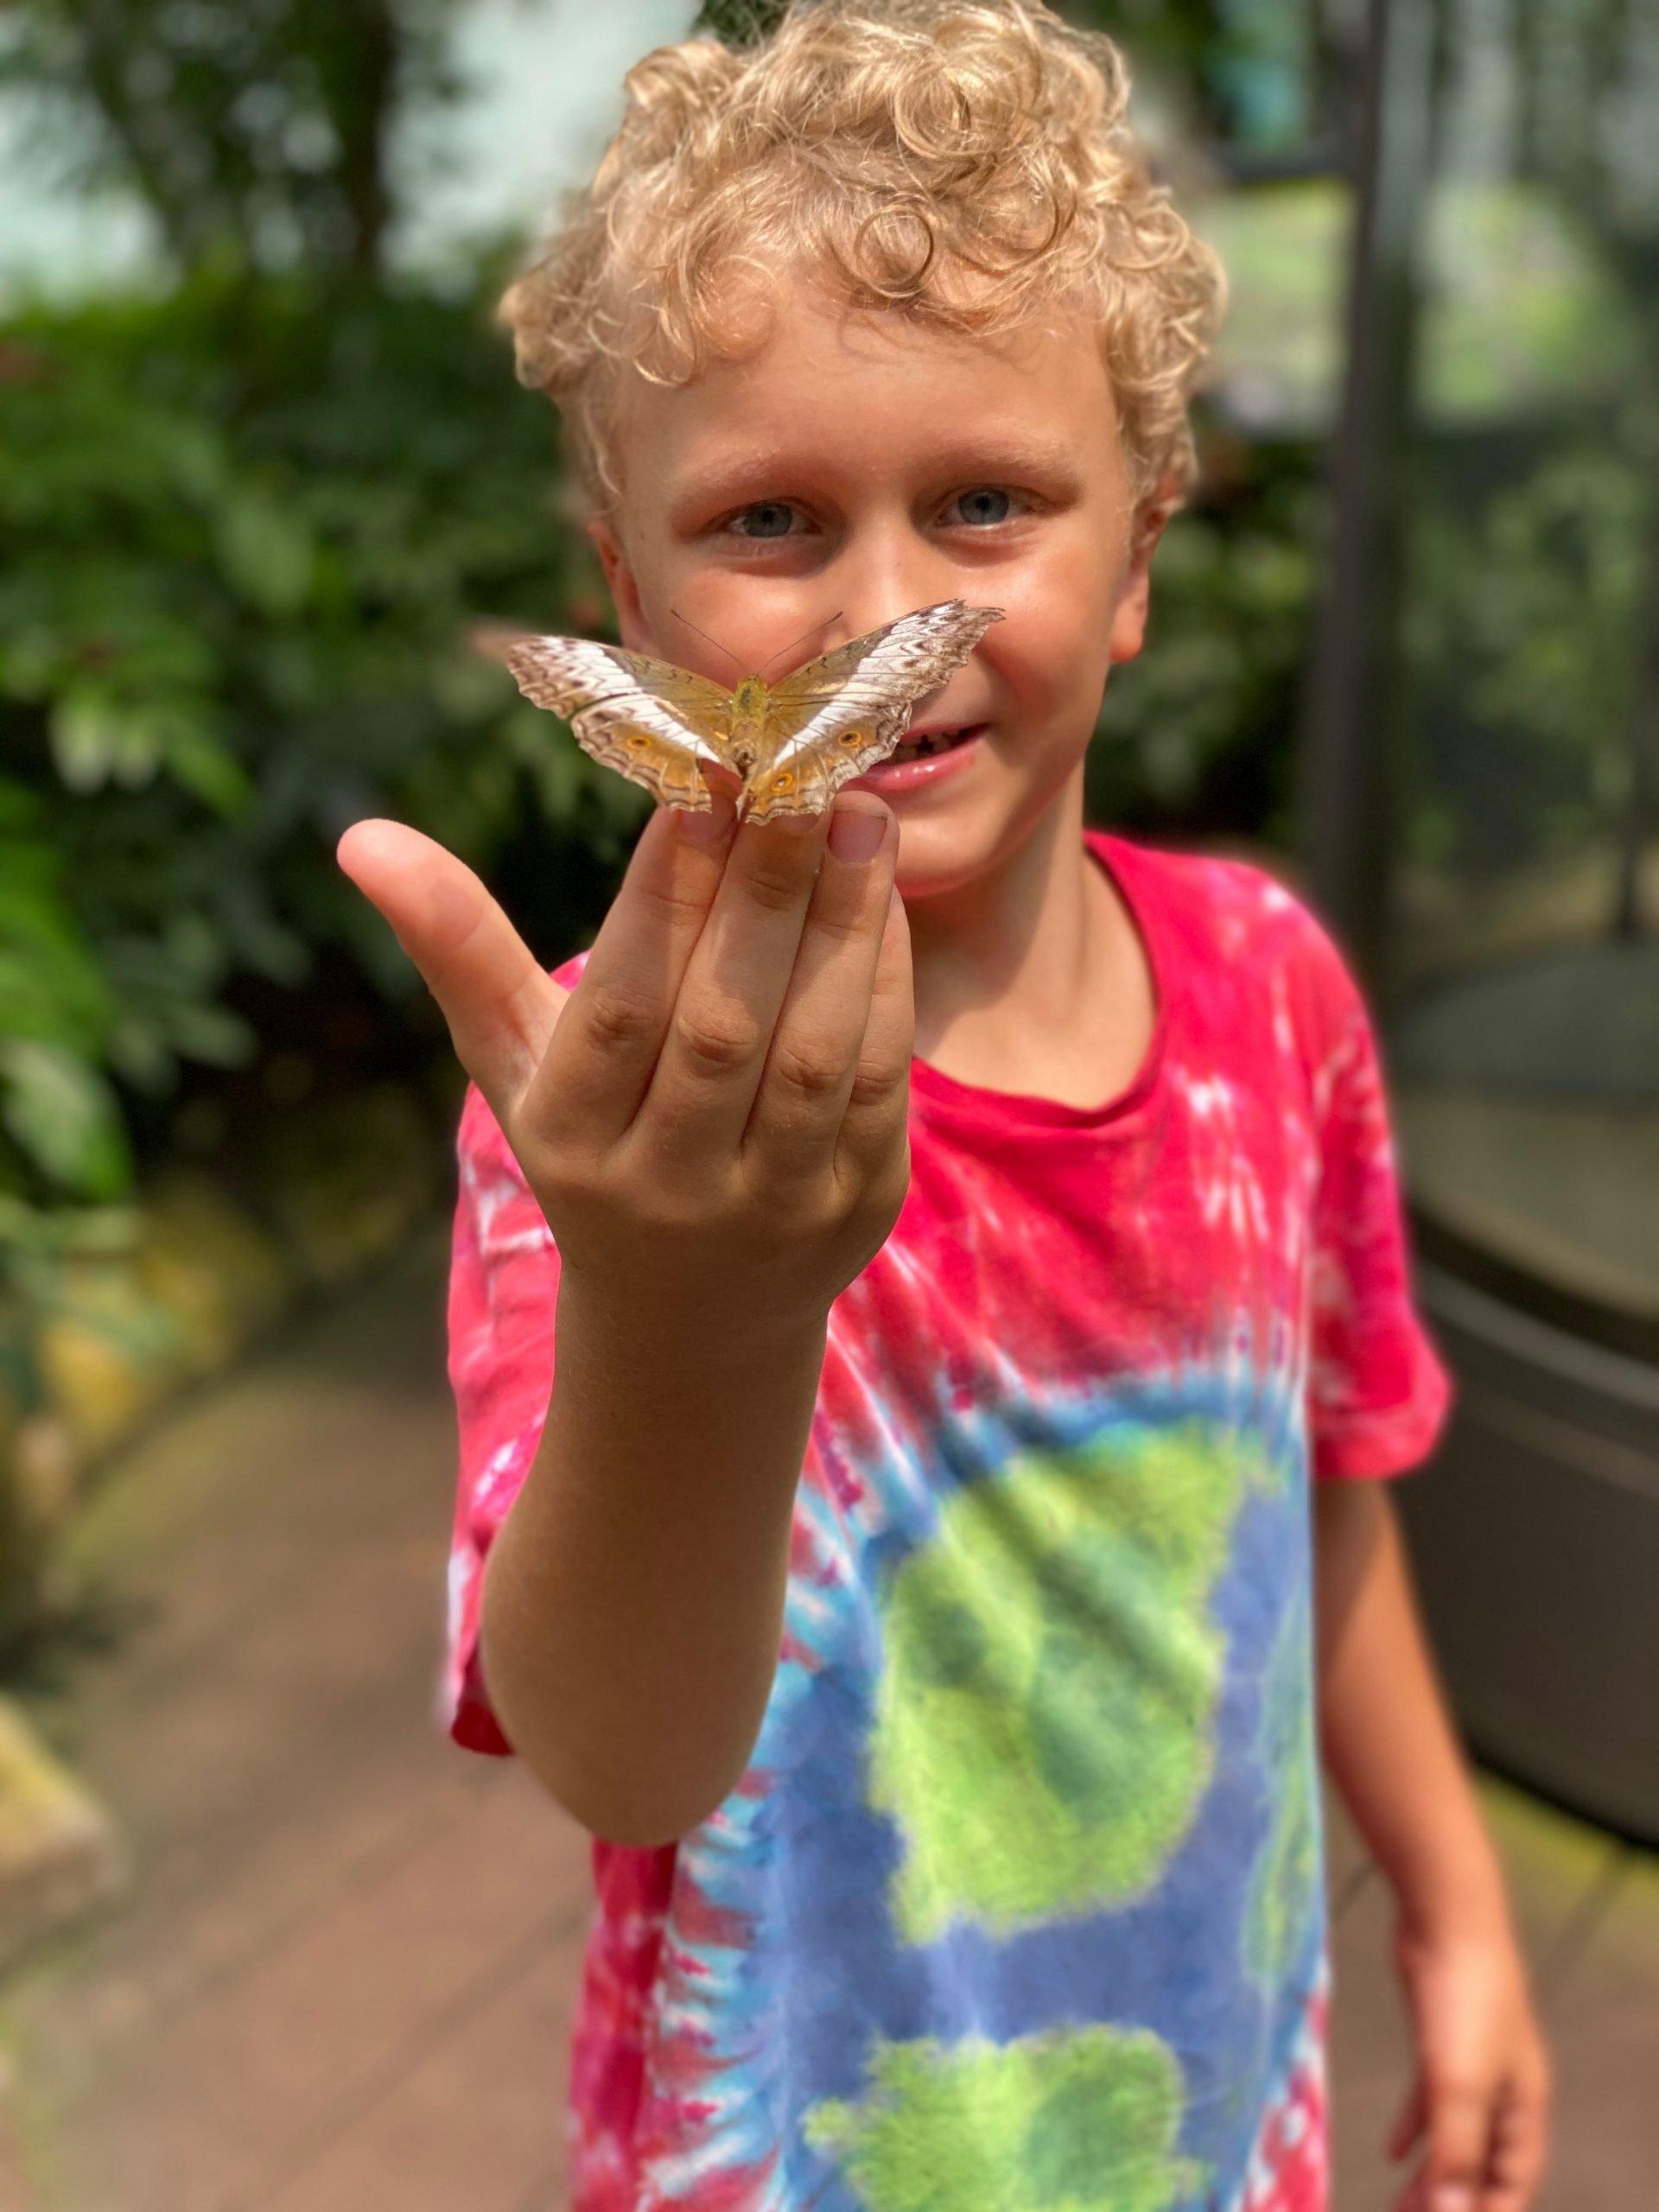 butterfly garden changi airport 800